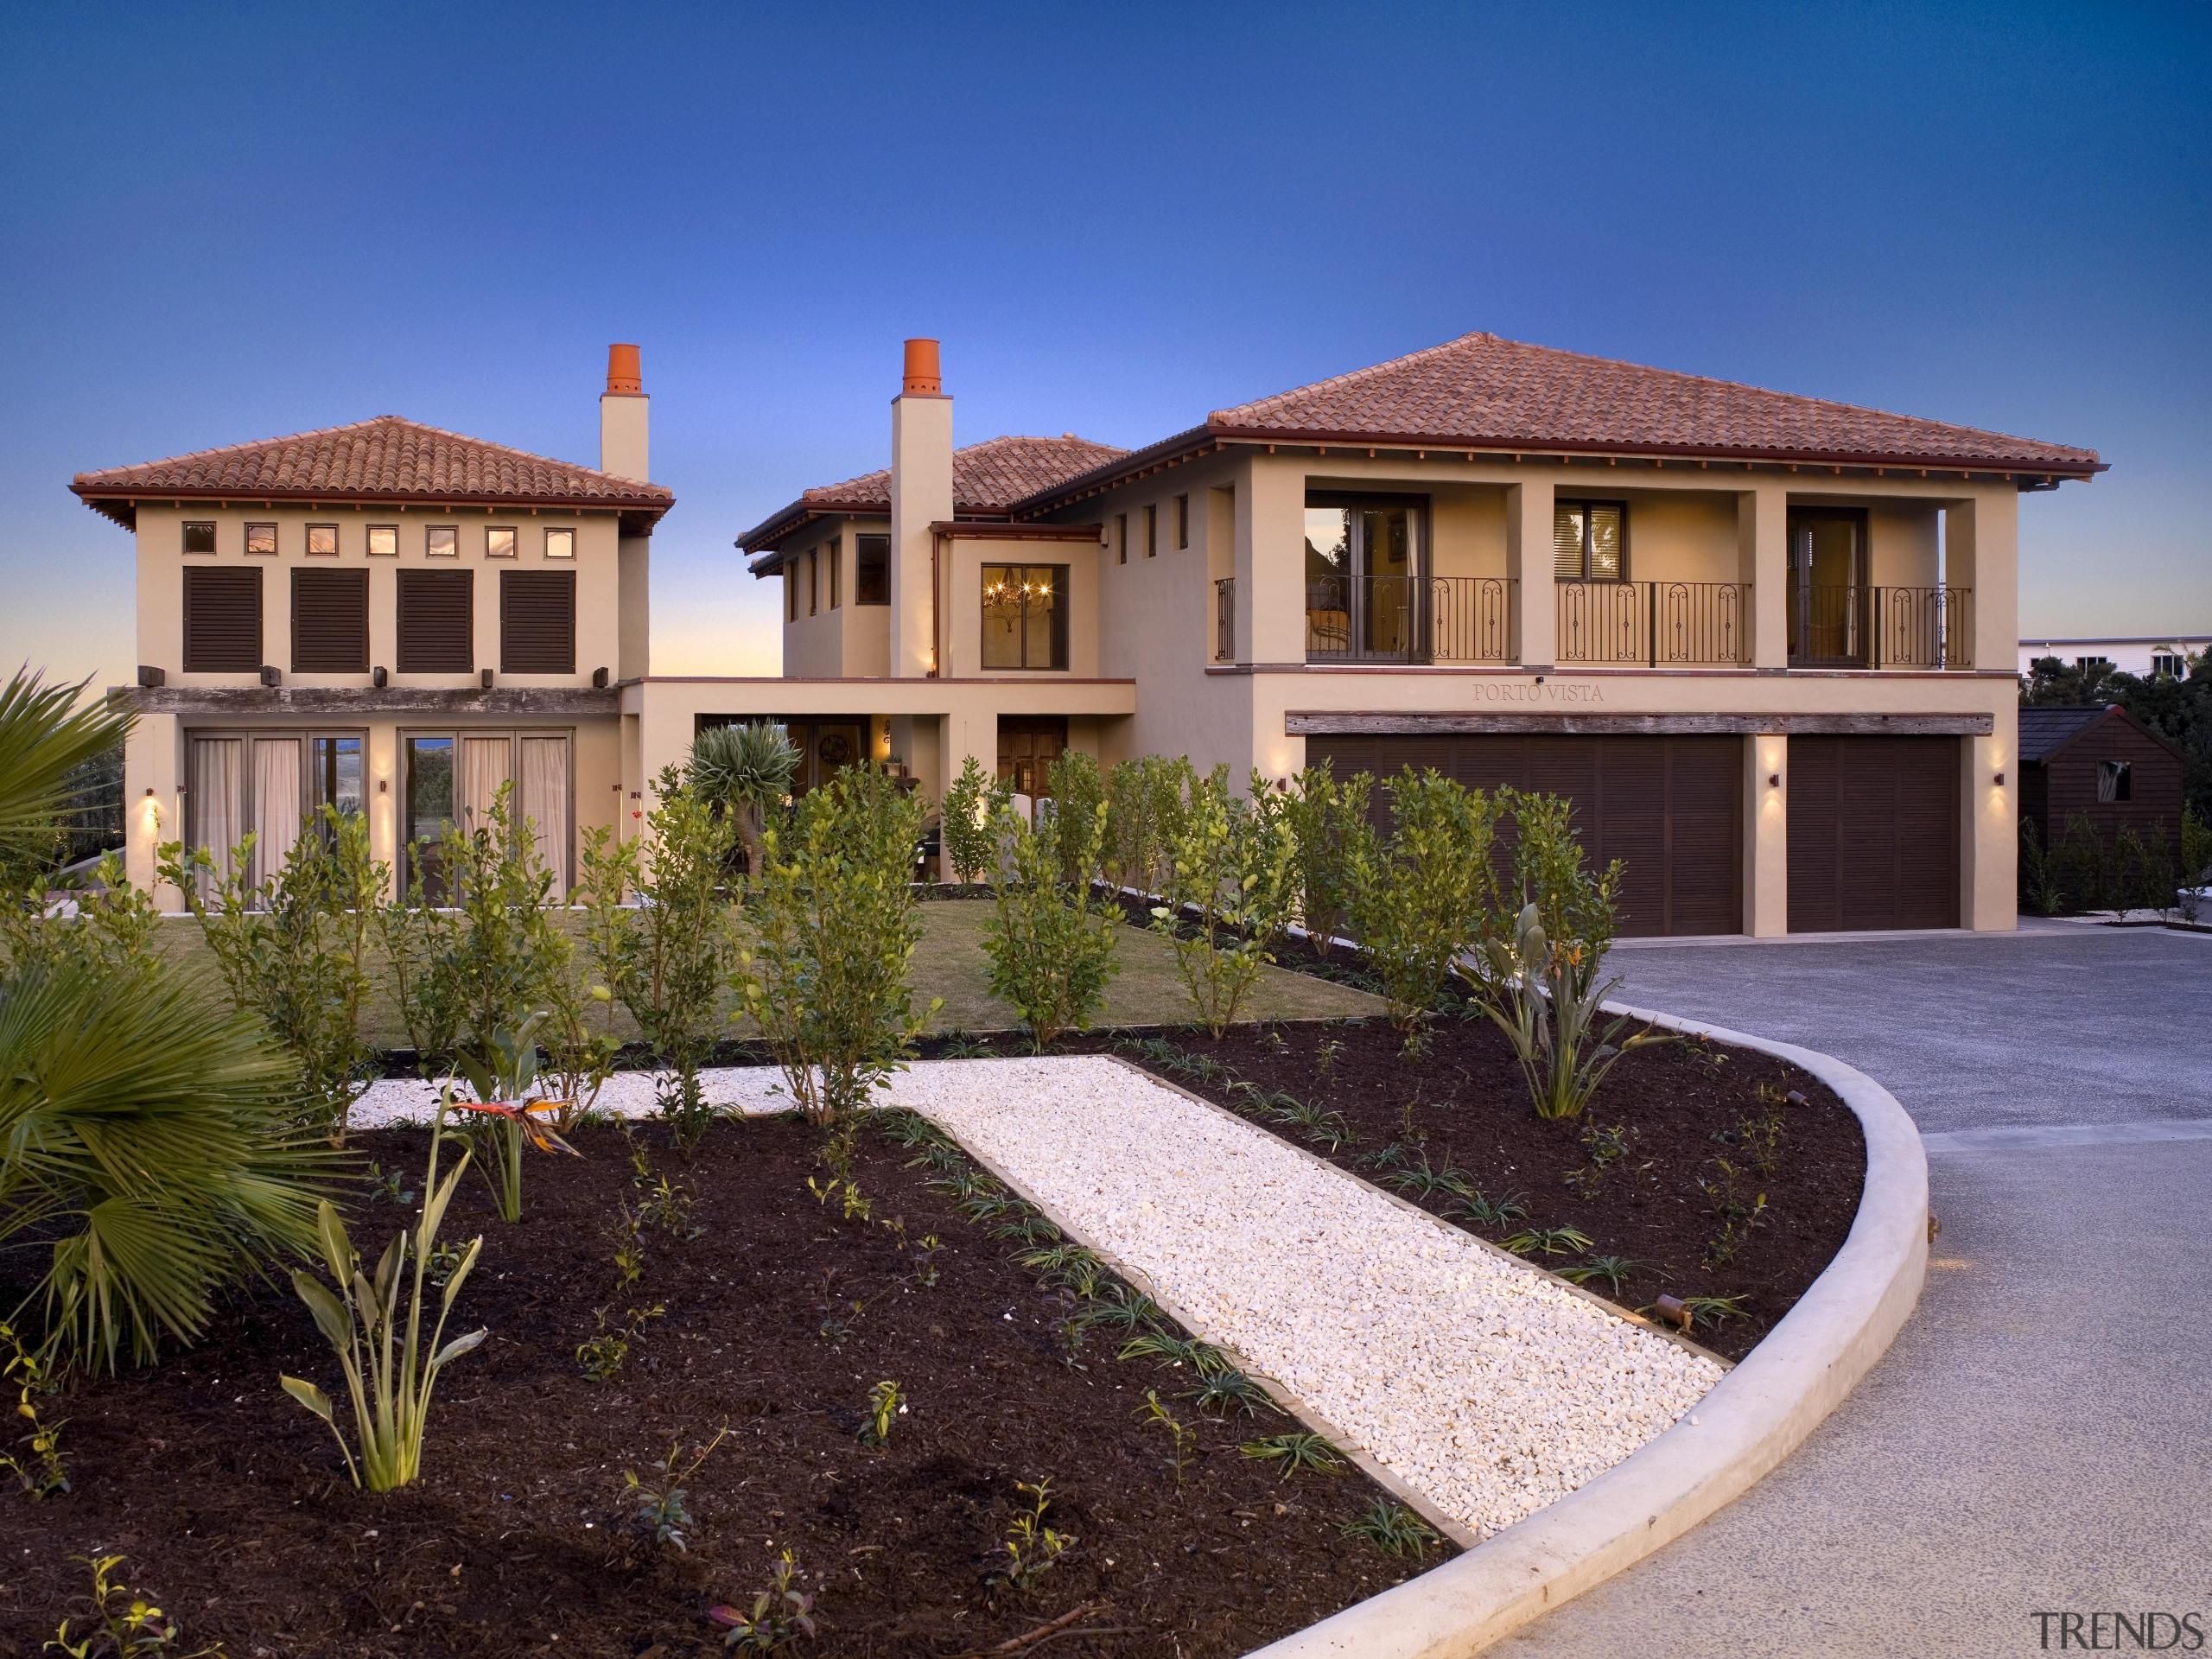 159mangawhai 1 - mangawhai_1 - building   elevation building, elevation, estate, facade, home, house, landscaping, mansion, property, real estate, residential area, roof, villa, blue